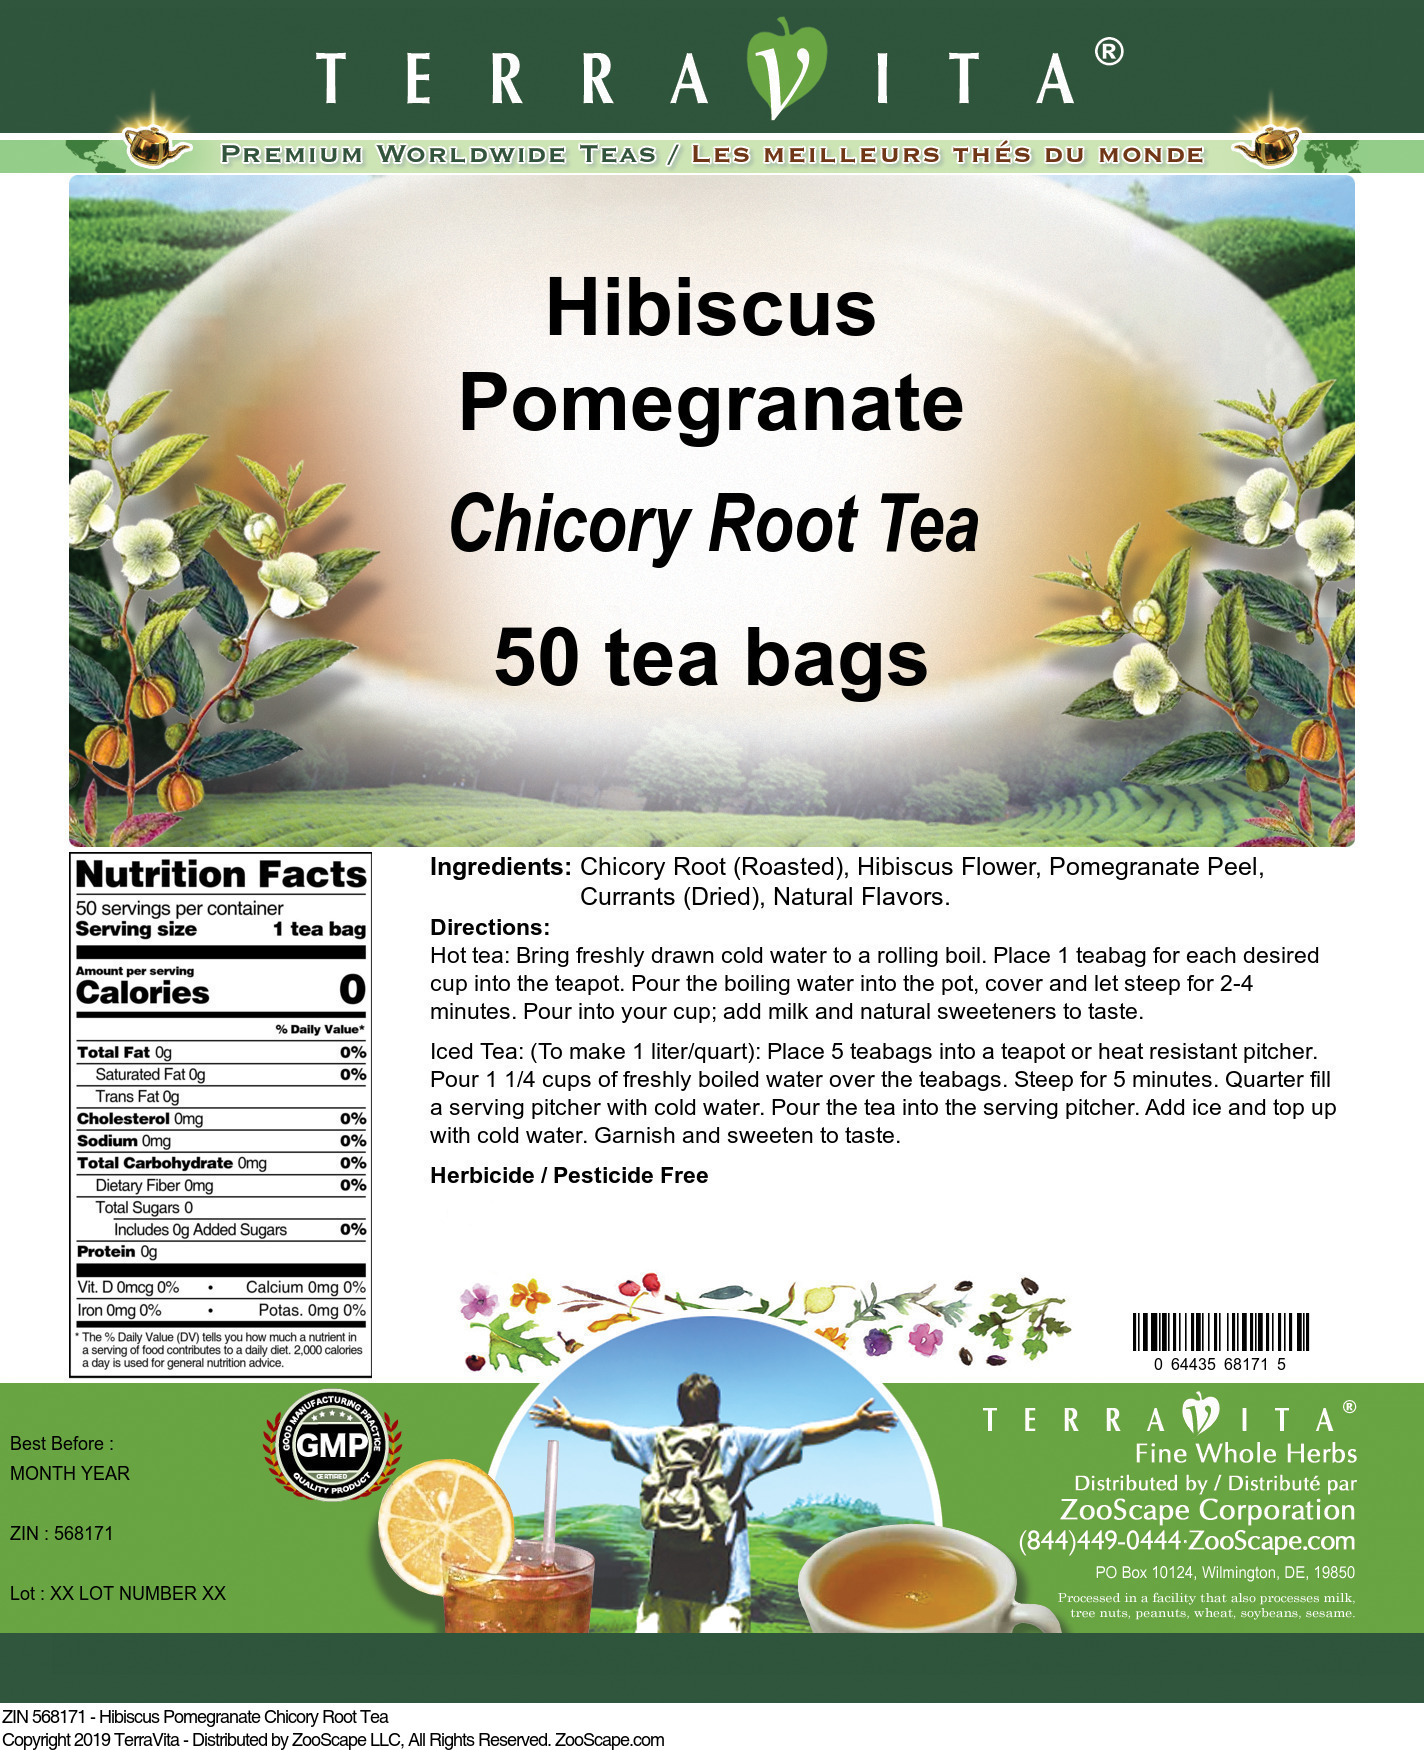 Hibiscus Pomegranate Chicory Root